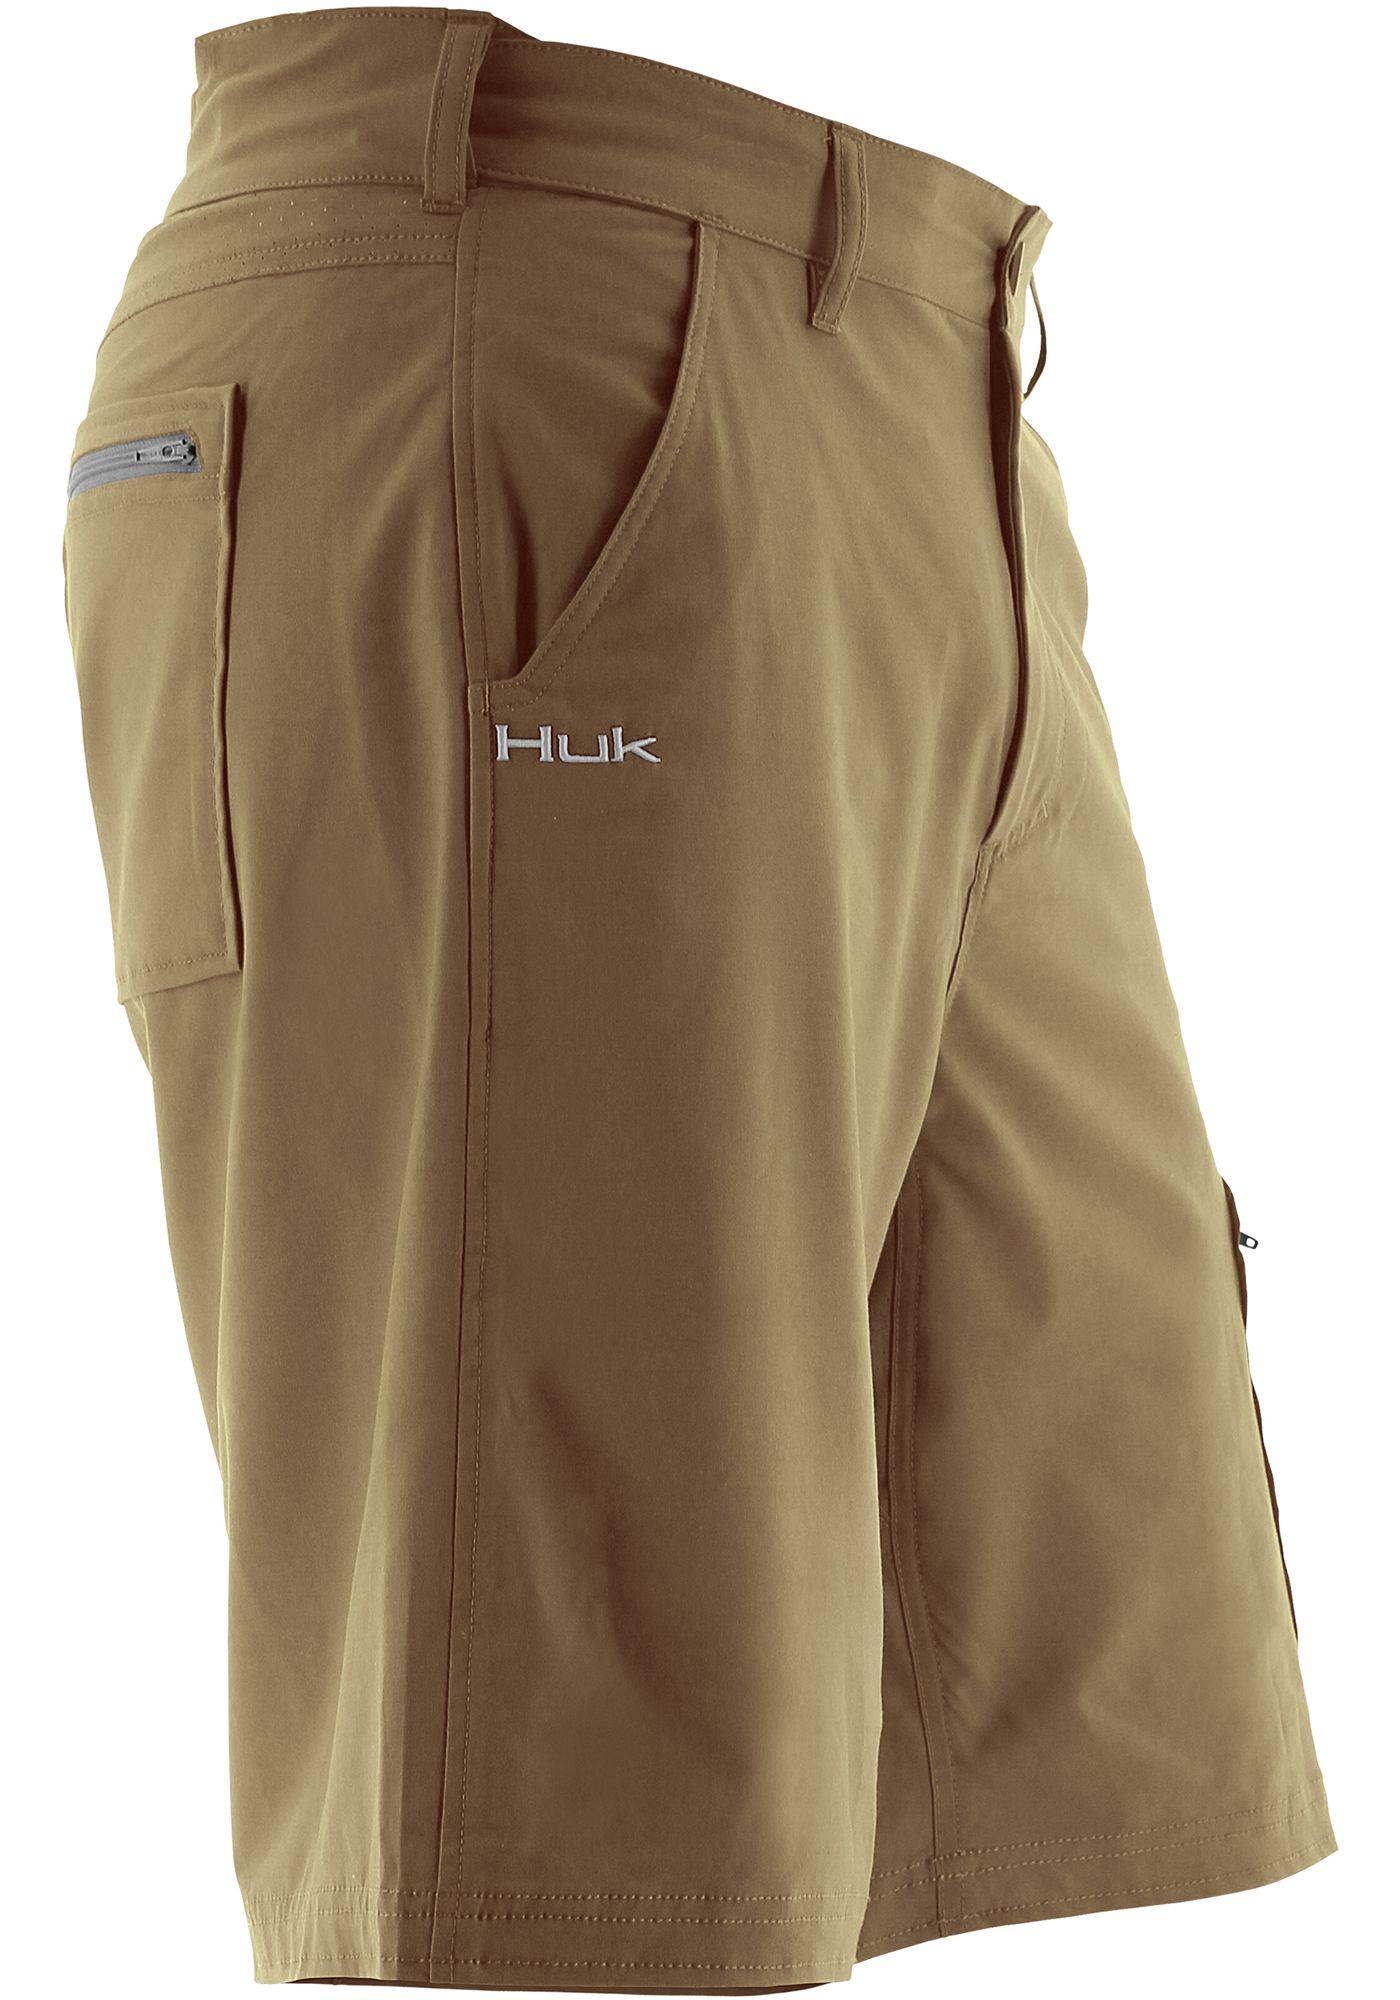 HUK Men's Next Level Shorts (Regular and Big & Tall)